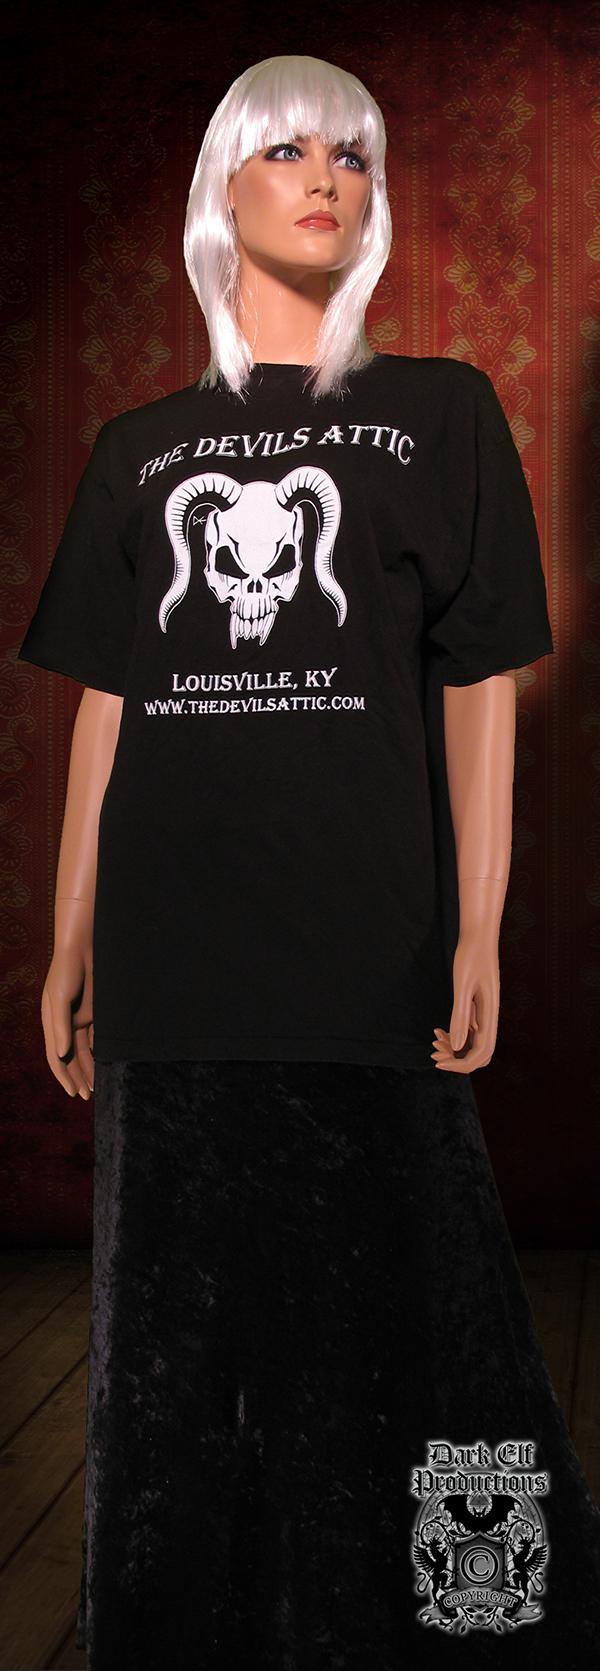 Shirt design louisville ky - Promotional Card For 2011 Screen Printed T Shirt Design